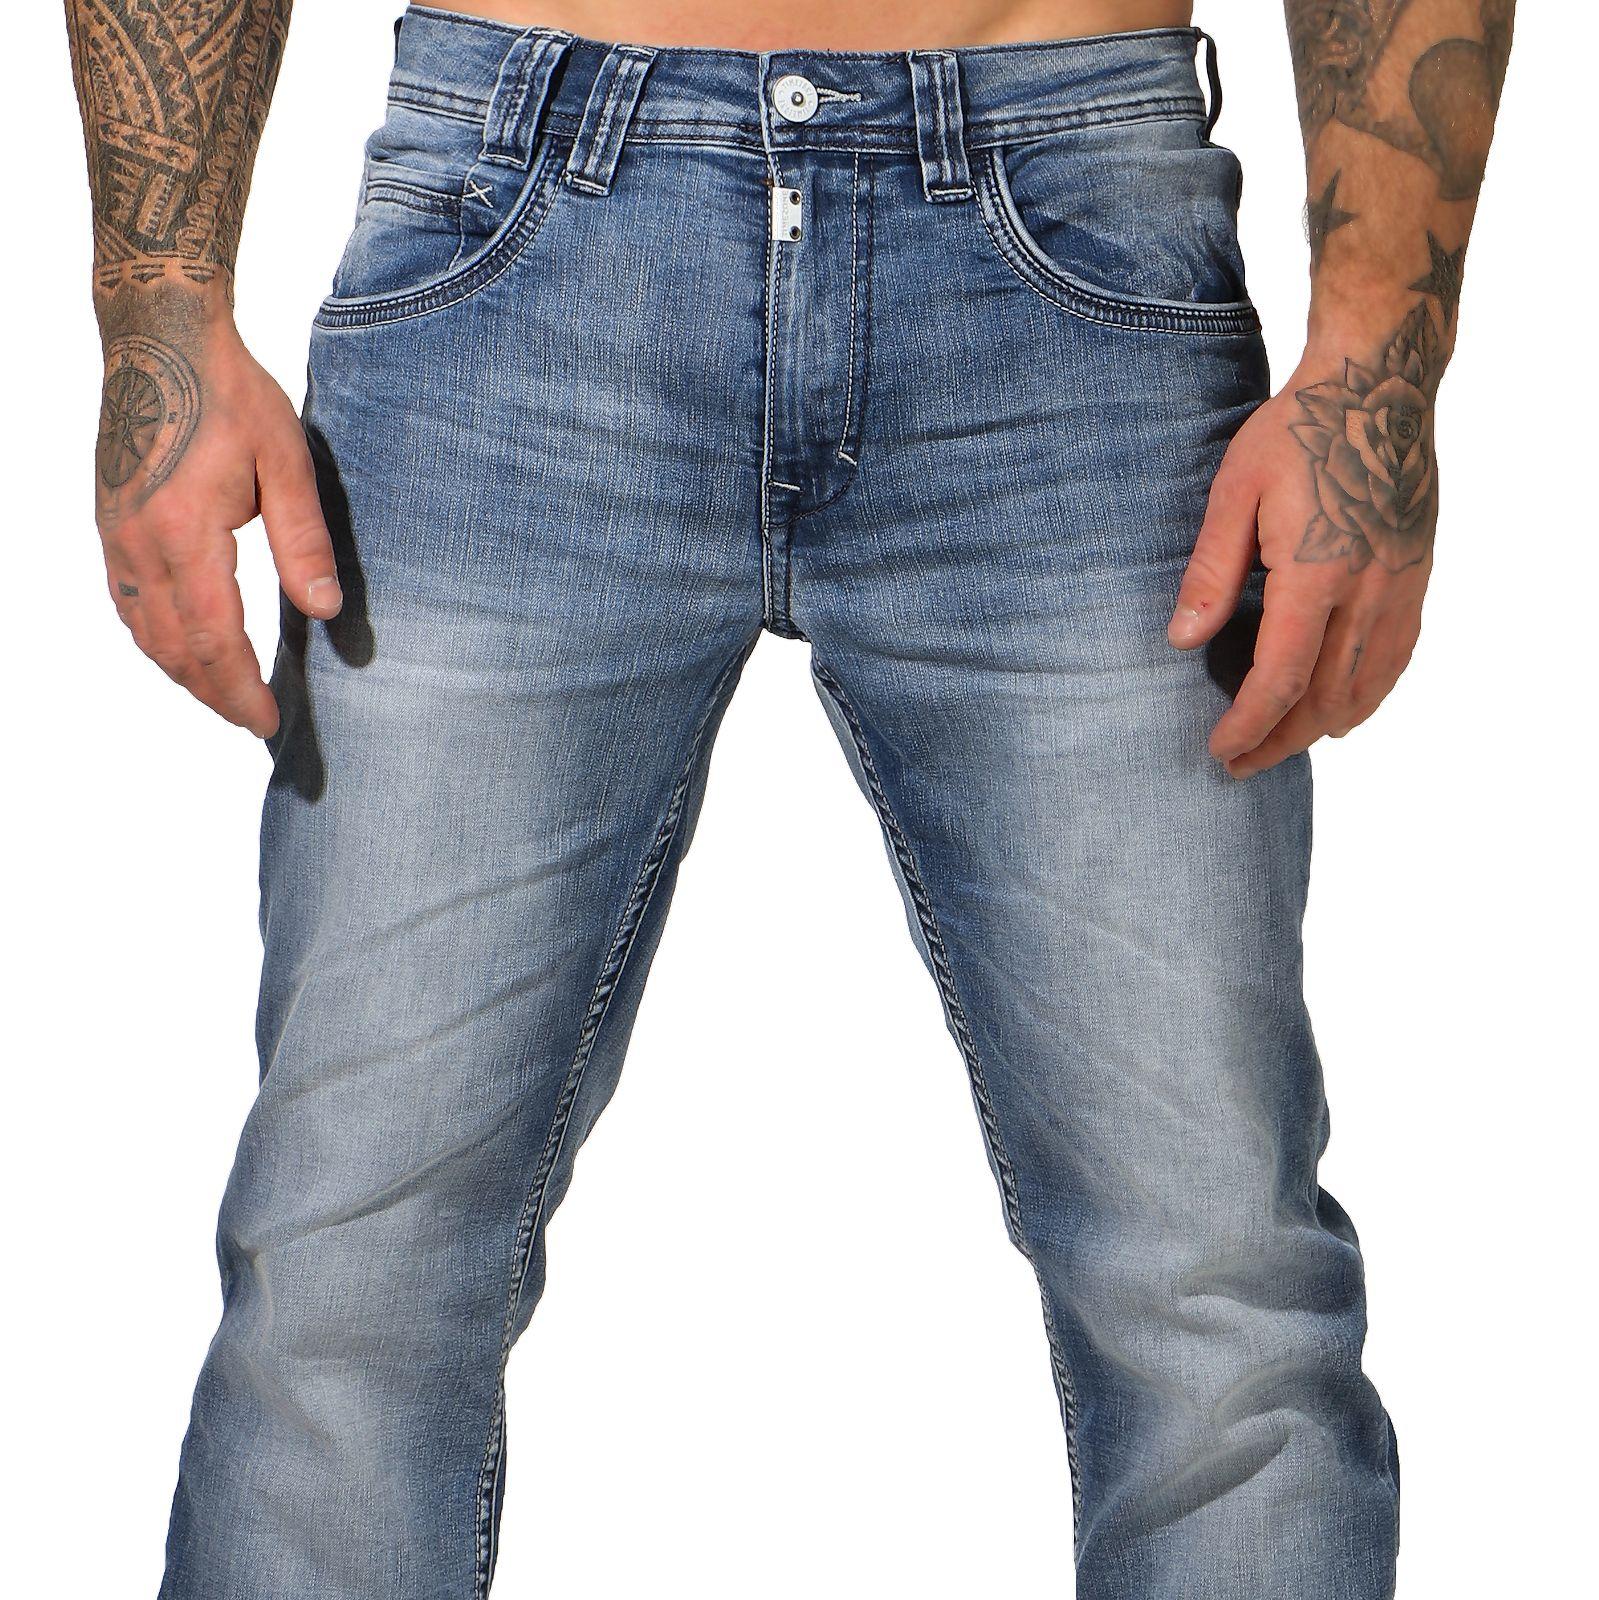 Timezone Herren Jeans 27 10015 Gerrit antique blue wash Slim